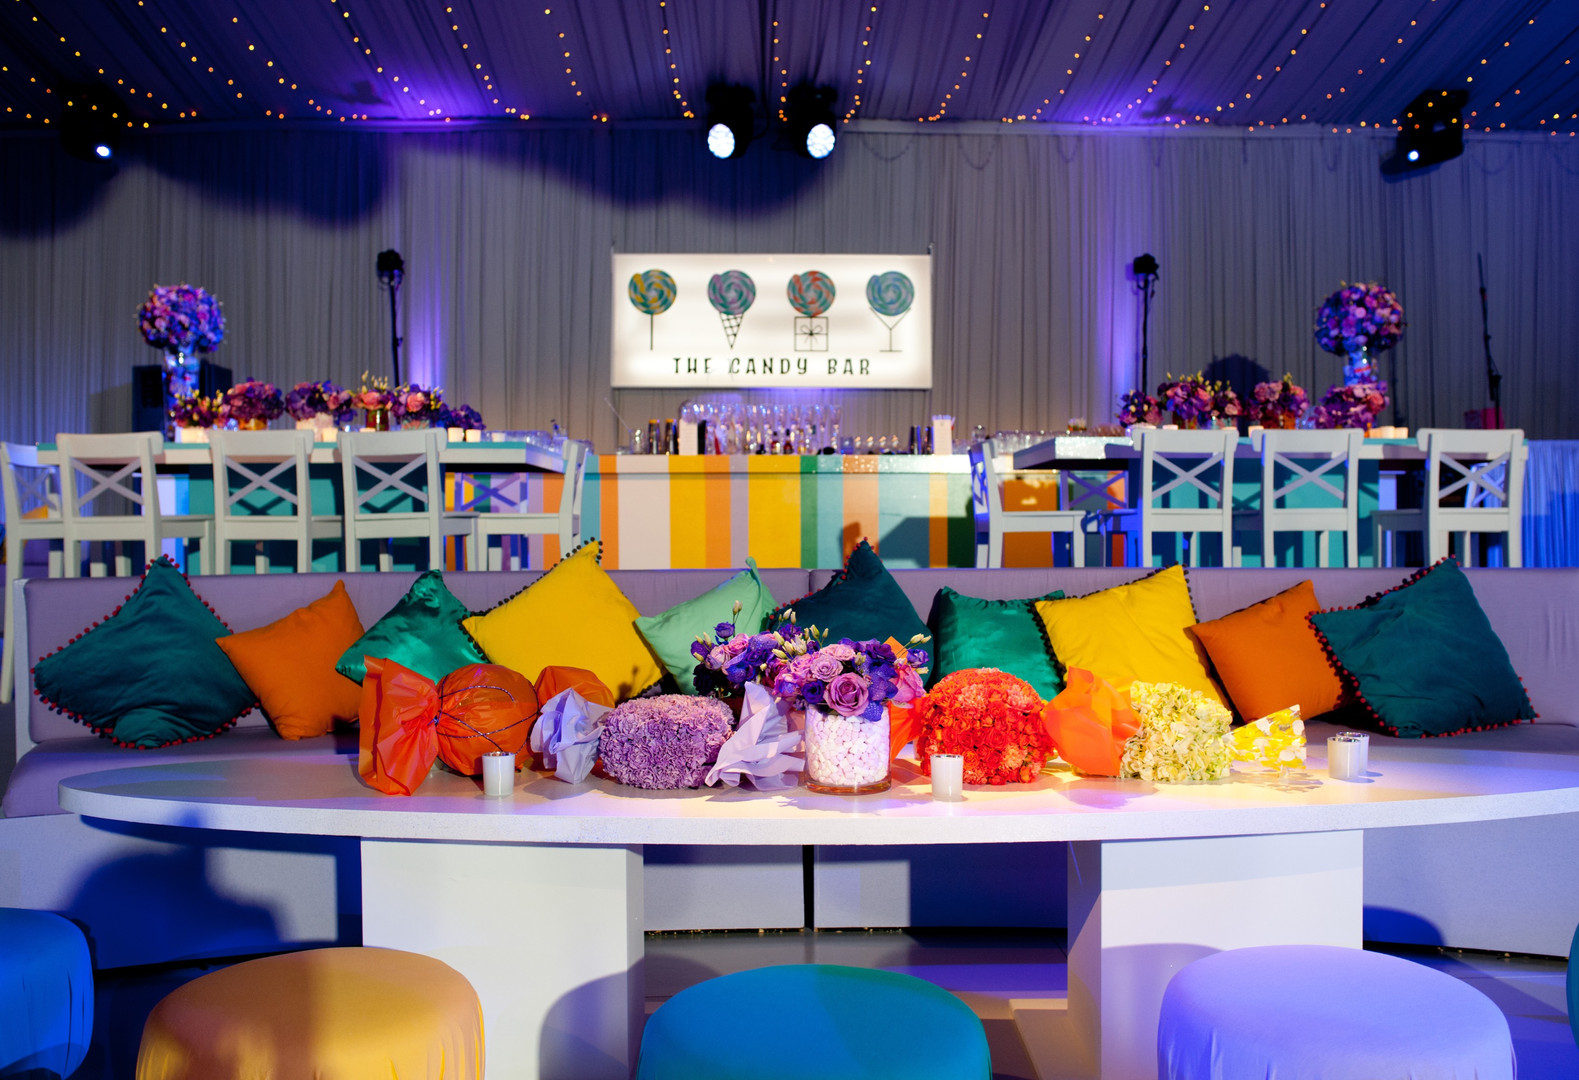 Sweet themed bar